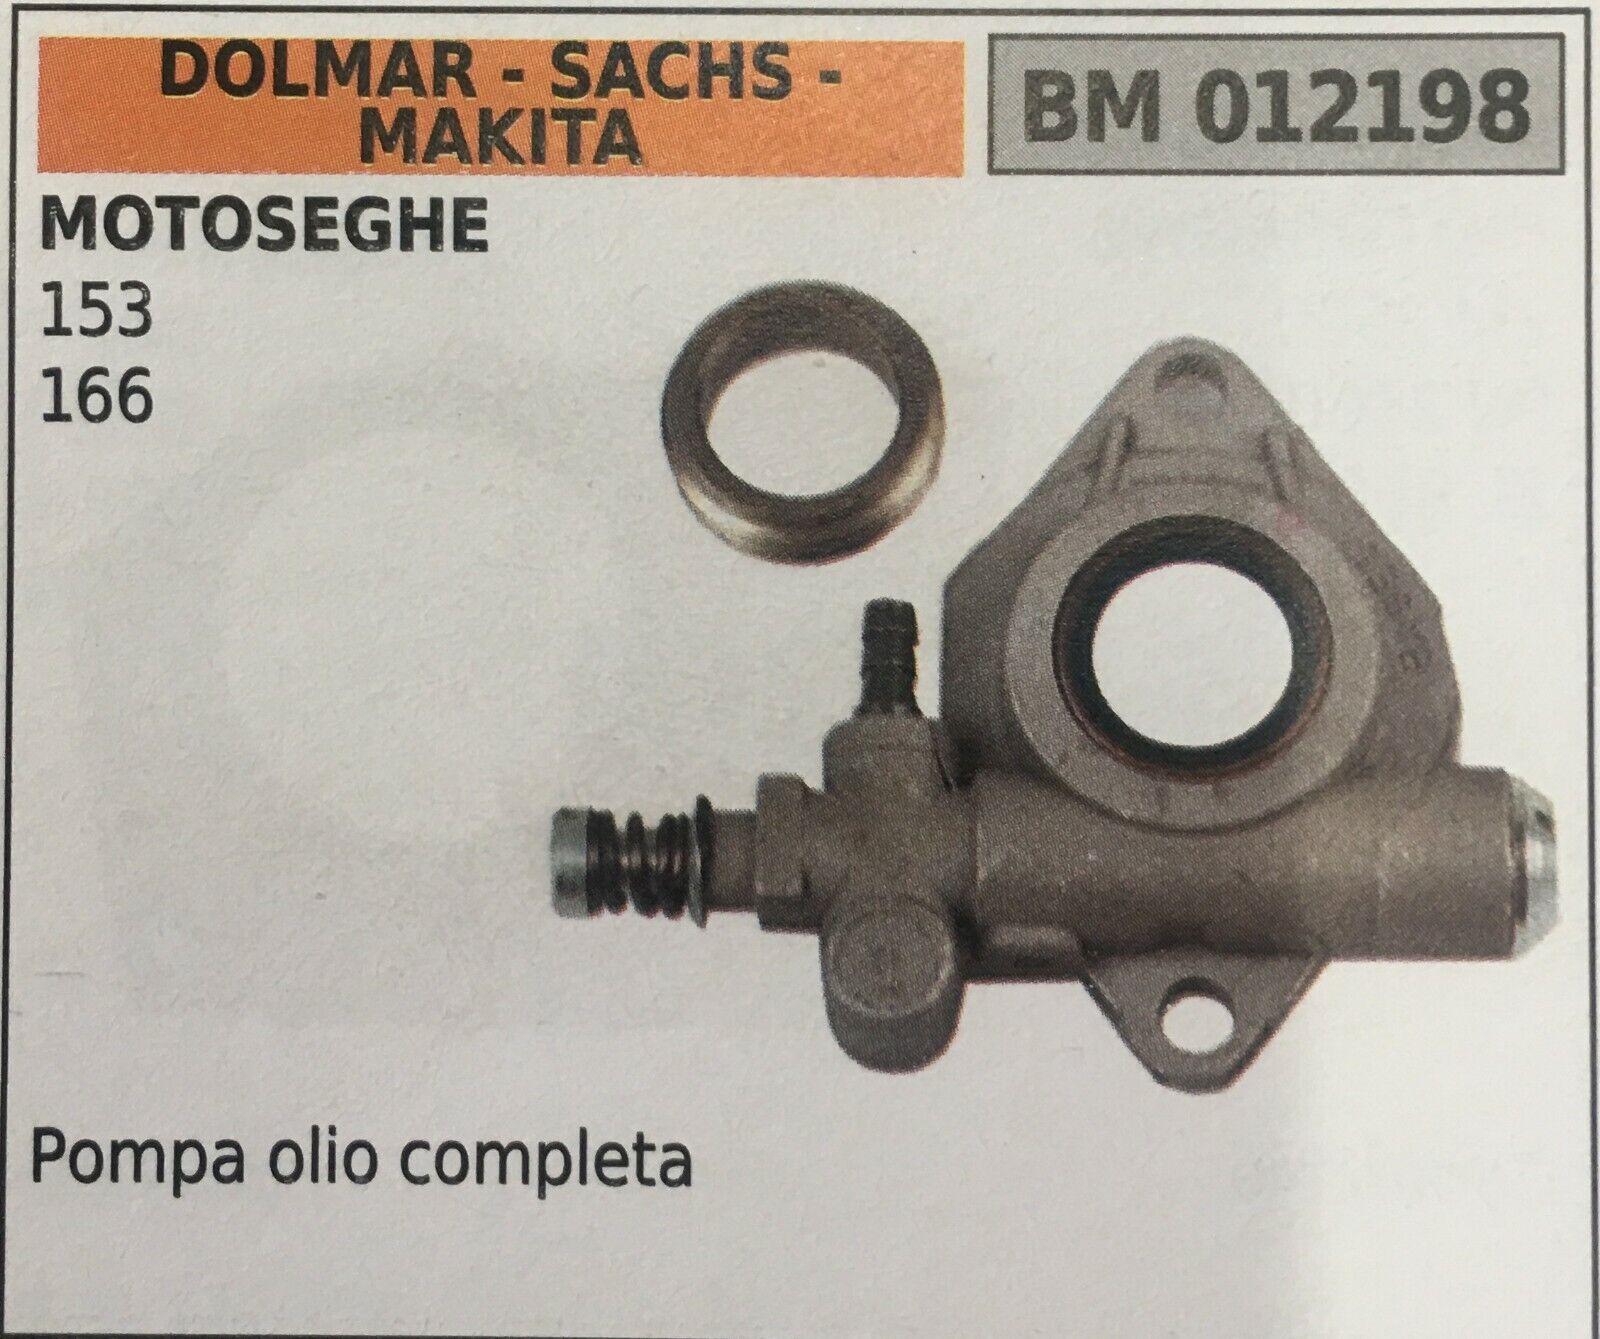 Bomba de Aceite Brumar BM012198 Dolmar - Sachs - Makita